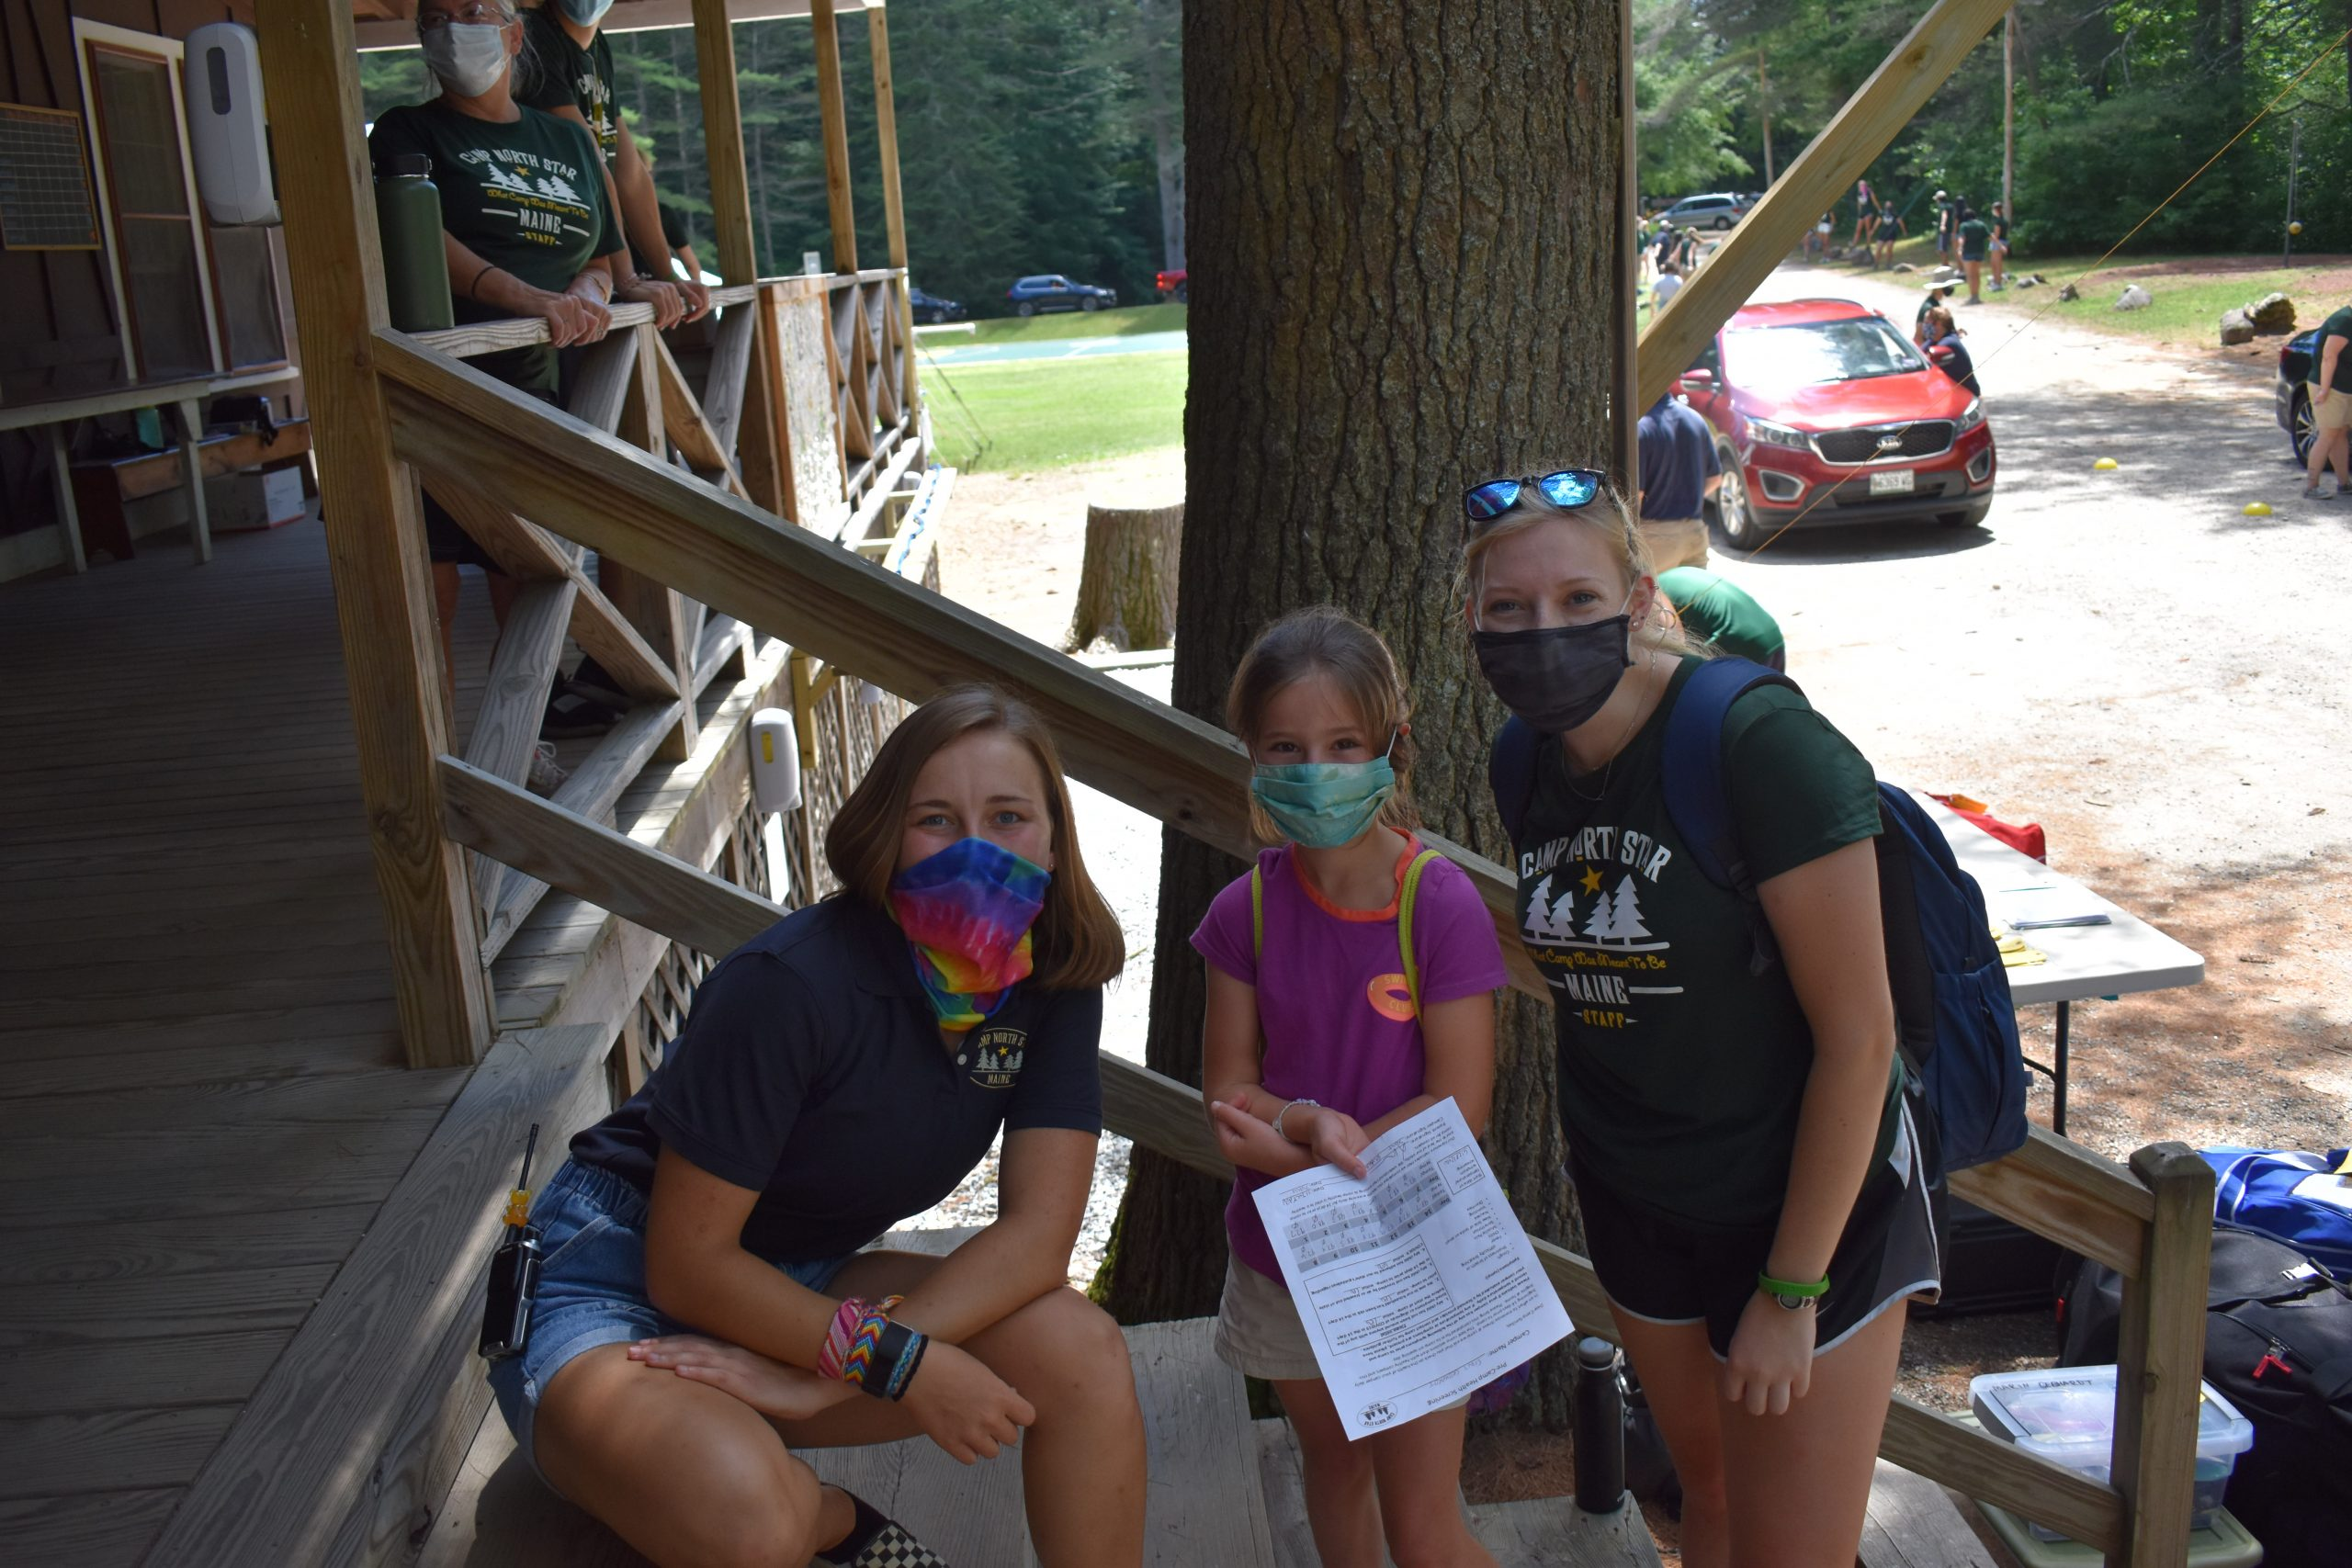 Camp North Star Maine COVID-19